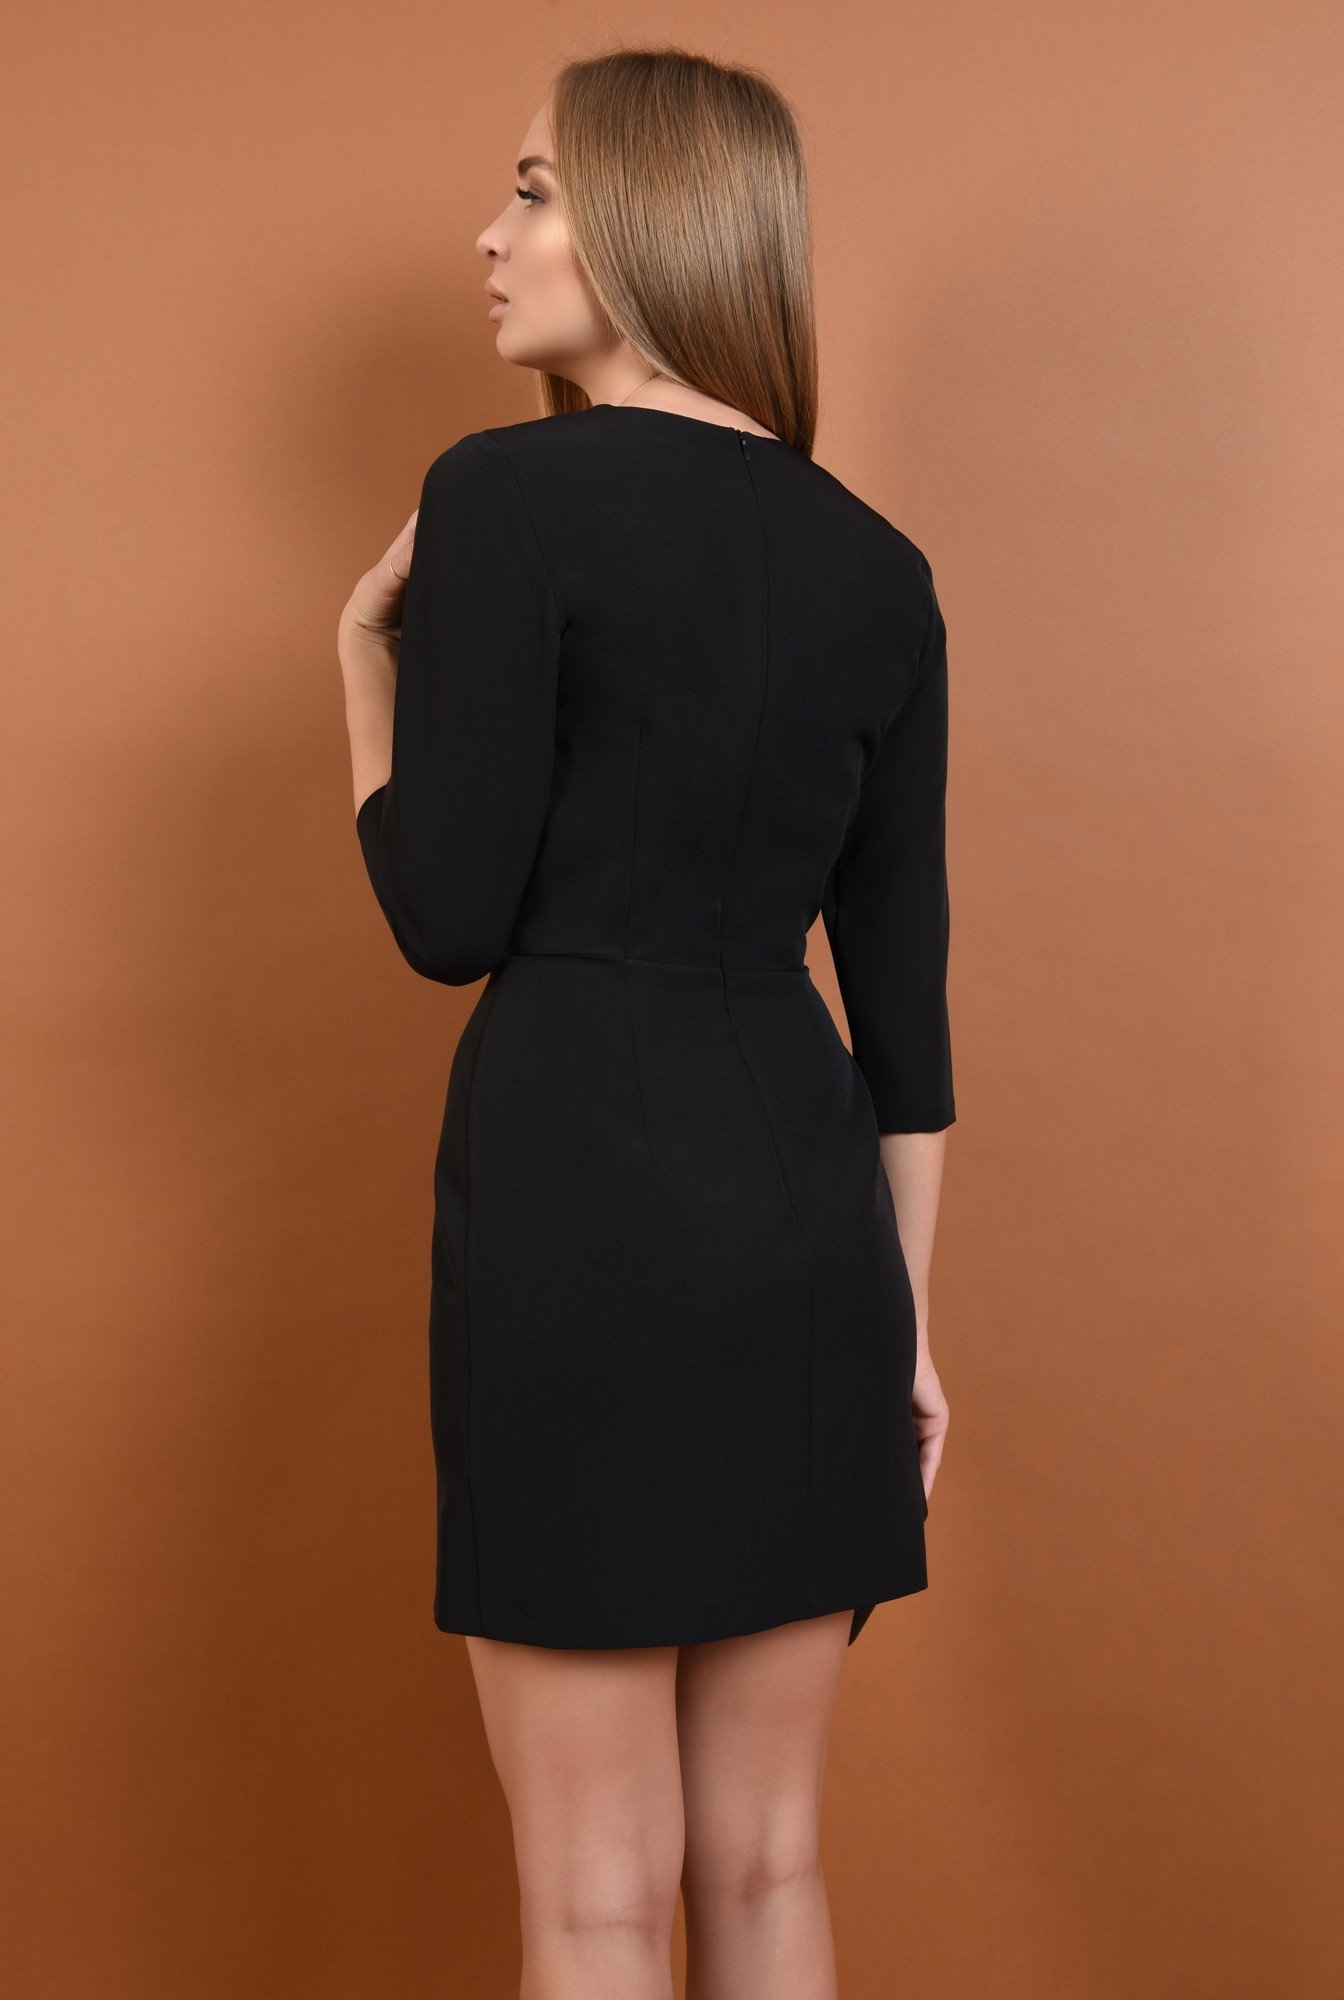 1 - 360 - rochie eleganta, cu volane, dantela aplicata, mini, croi cambrat, rochii online